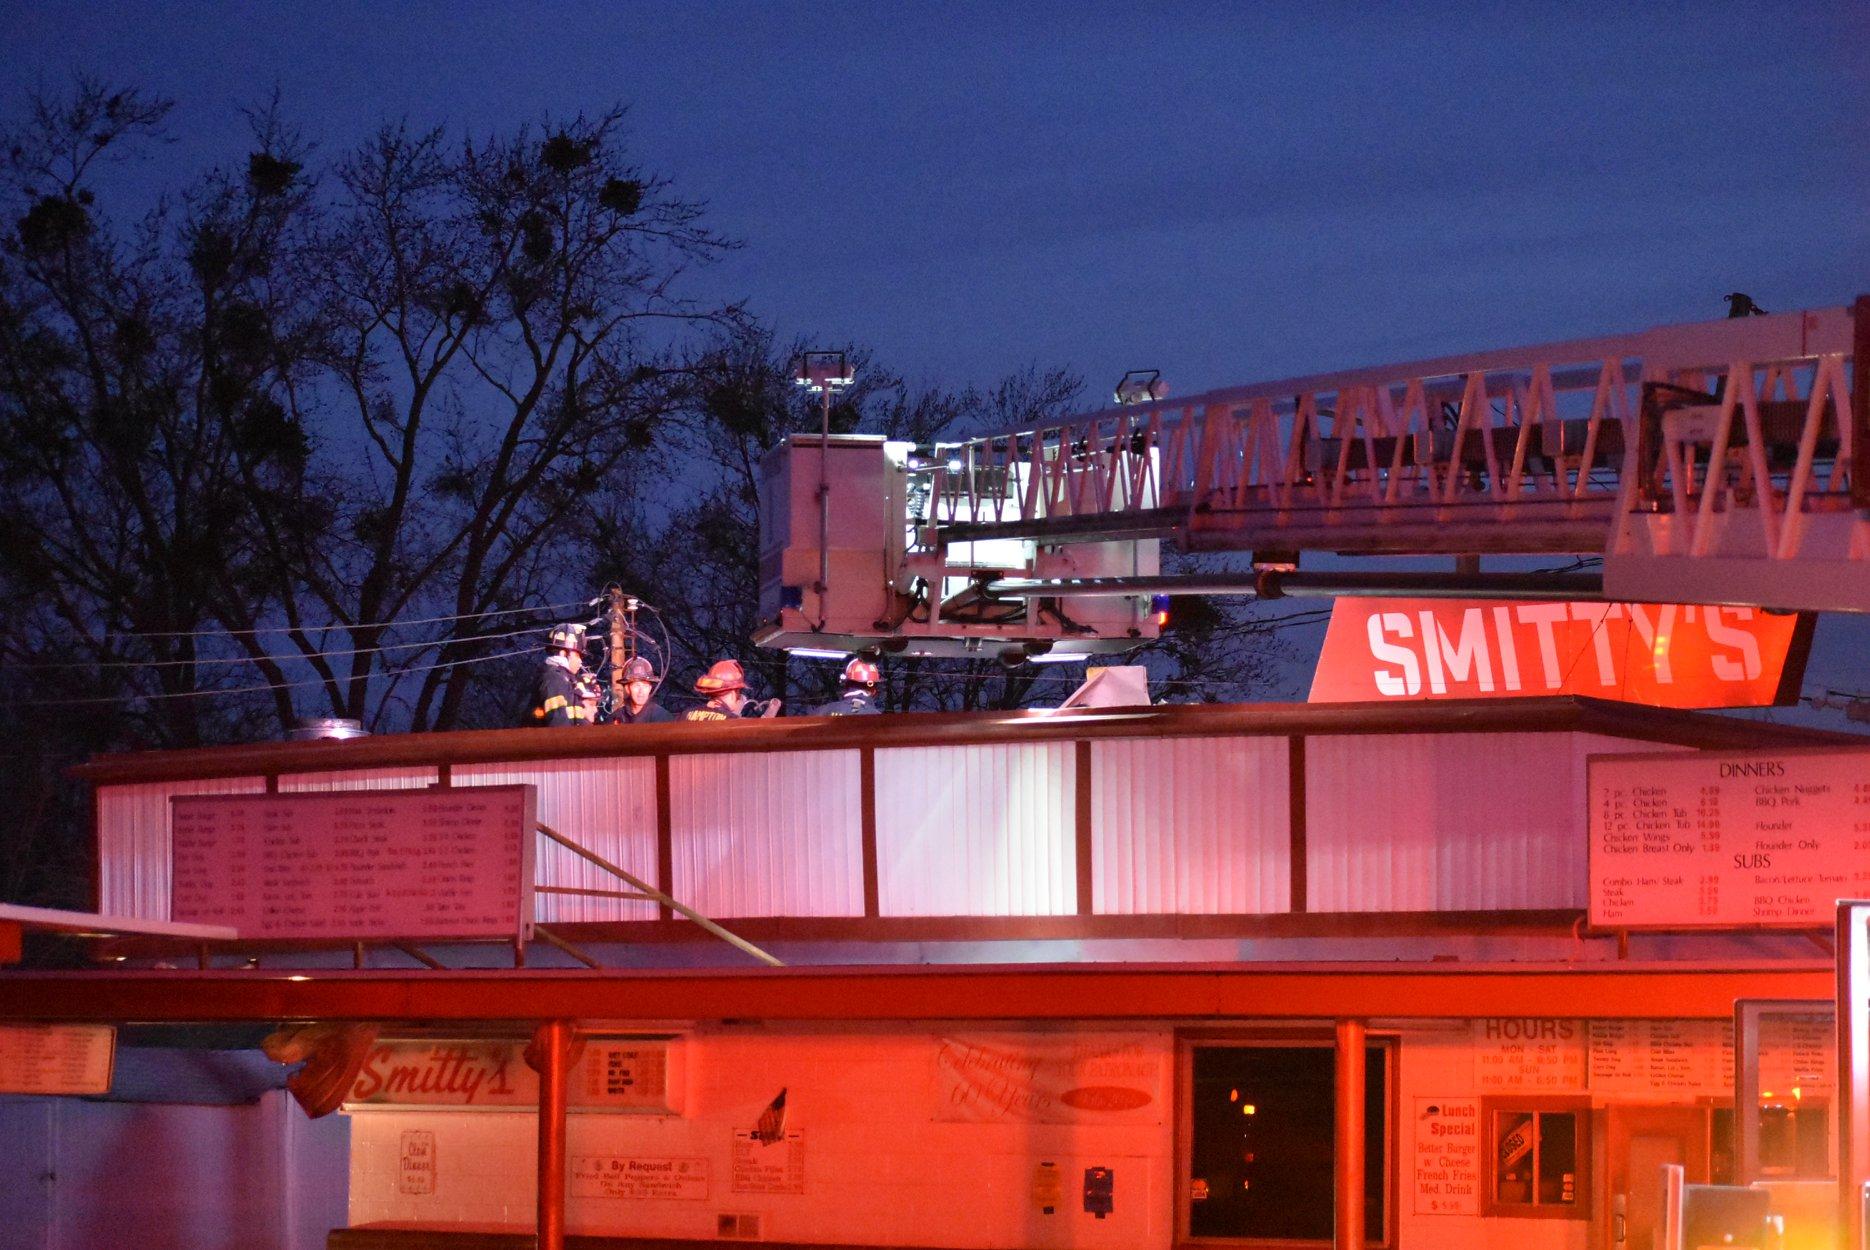 Hampton Smitty's Better Burger Fire_1552567821288.jpg.jpg